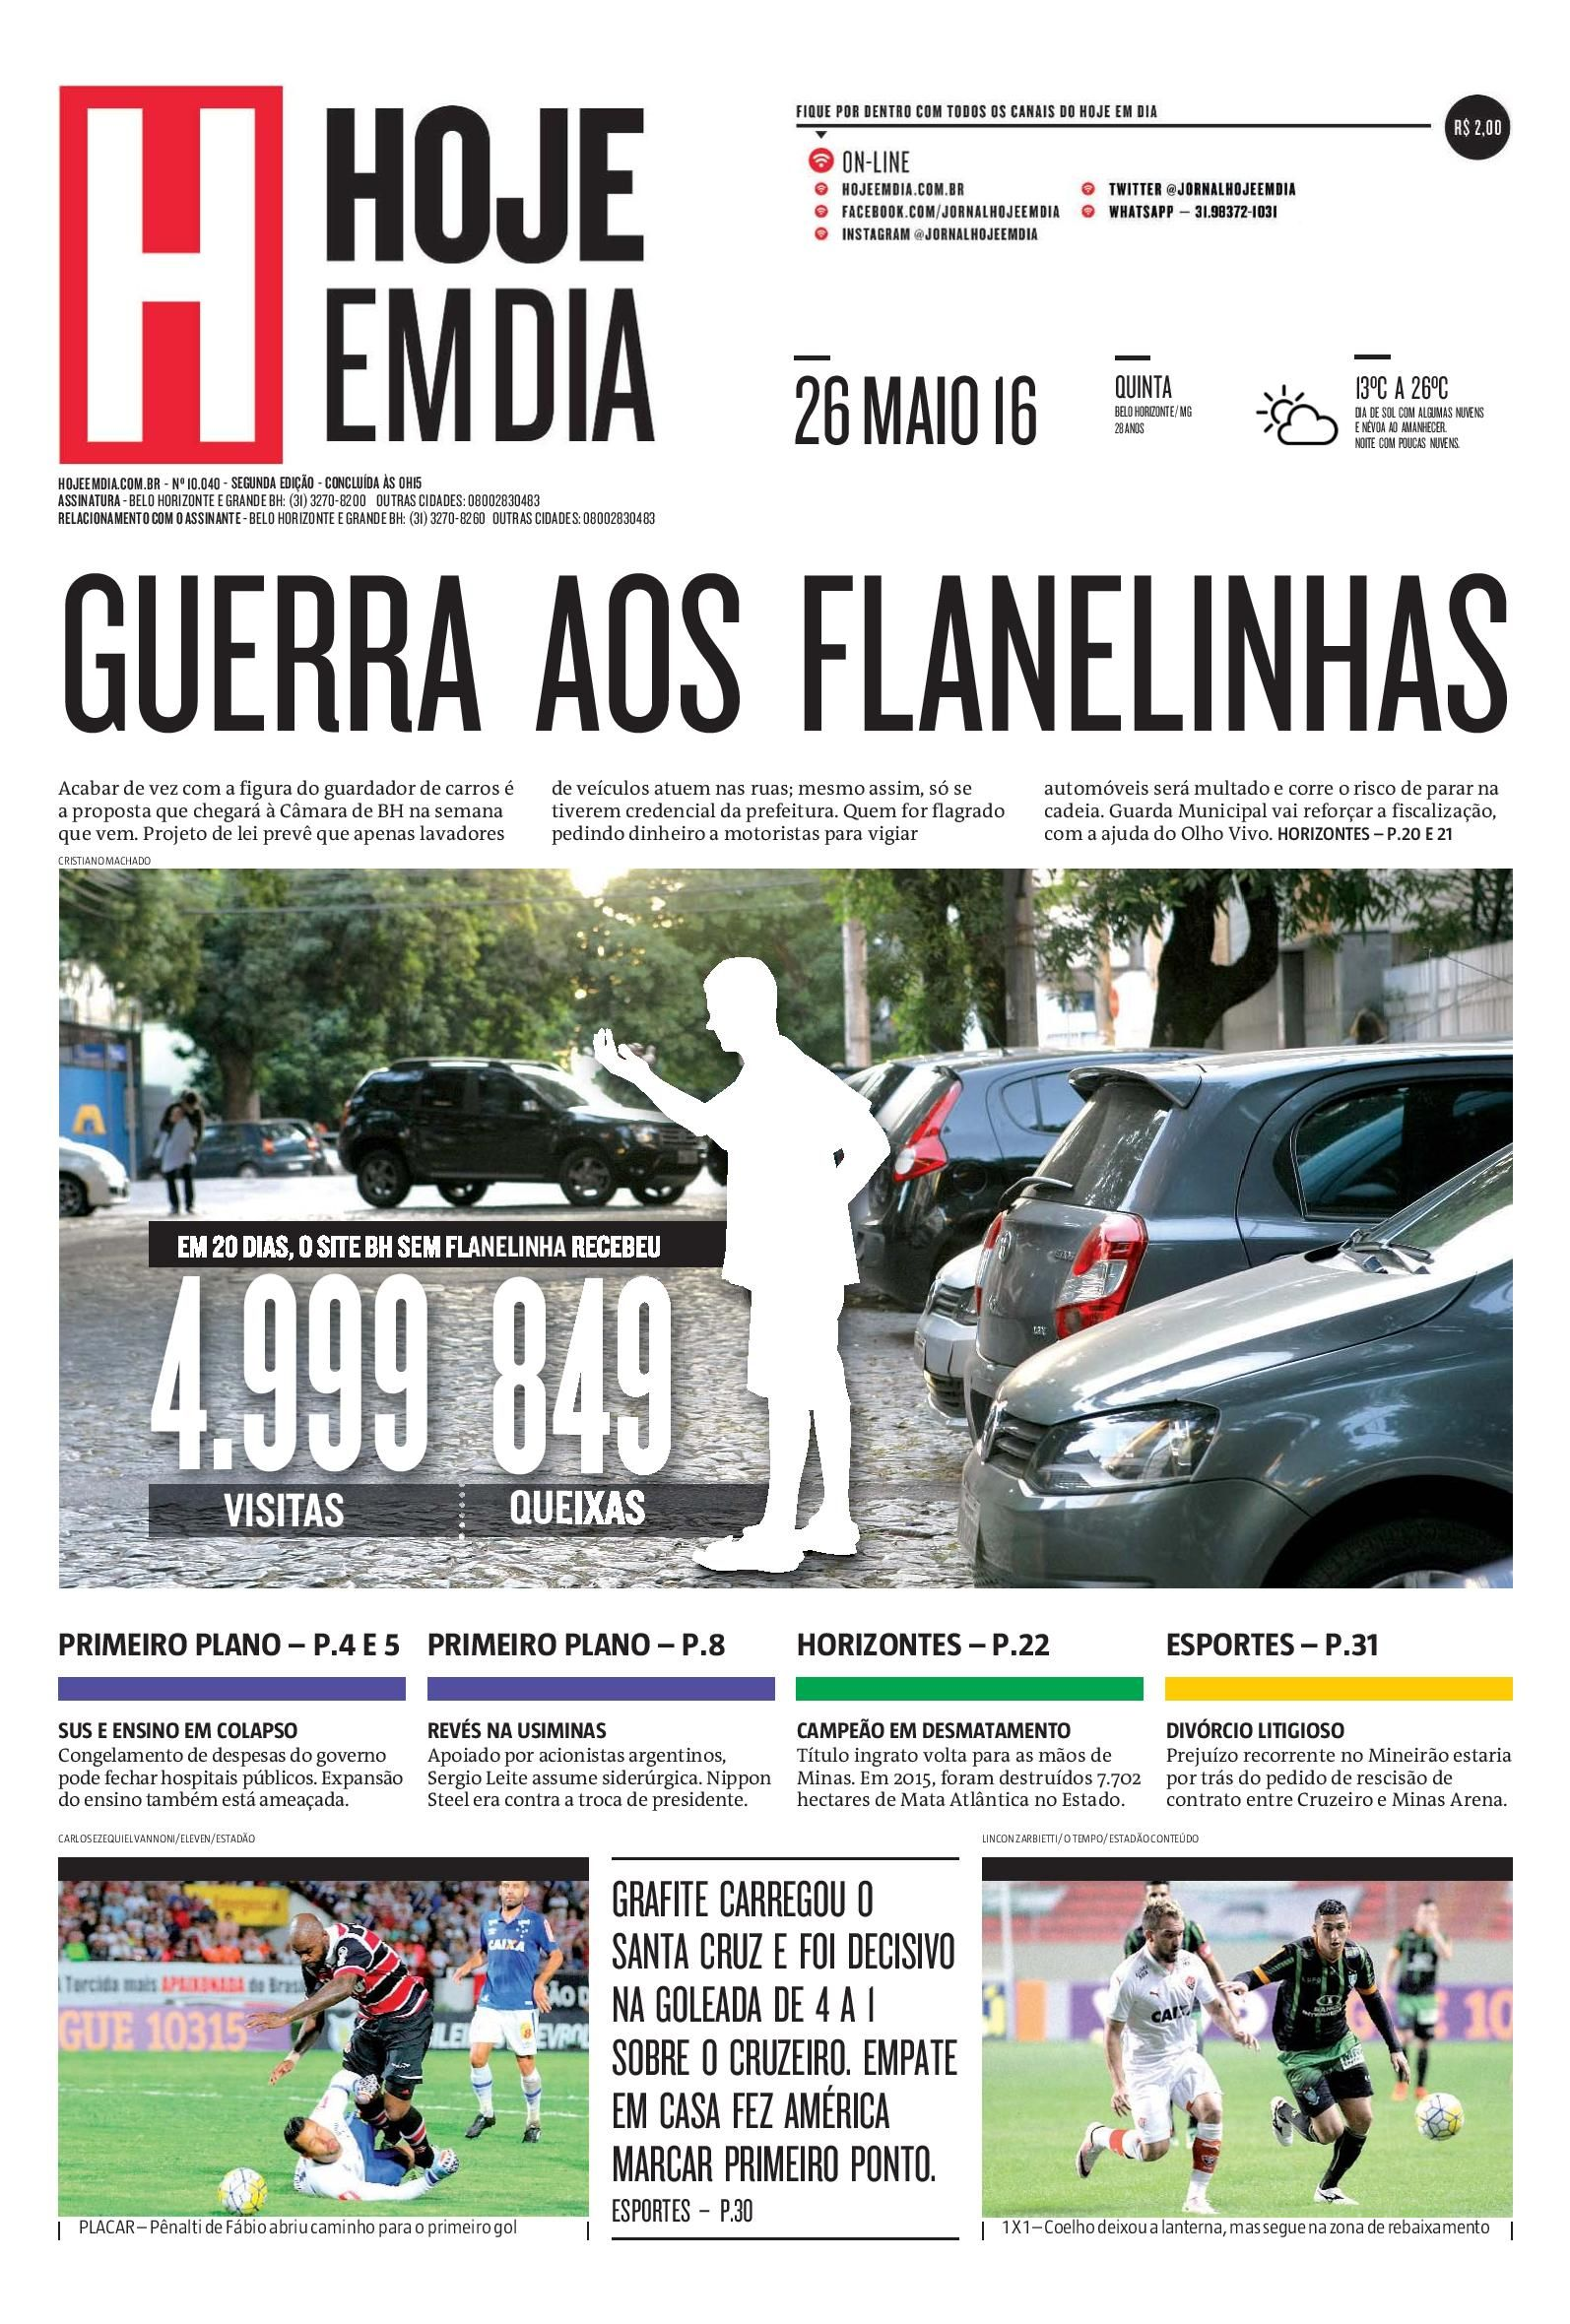 Capa do dia 26/05/2016 #HojeEmDia #Jornal #Notícias #News #Newspaper